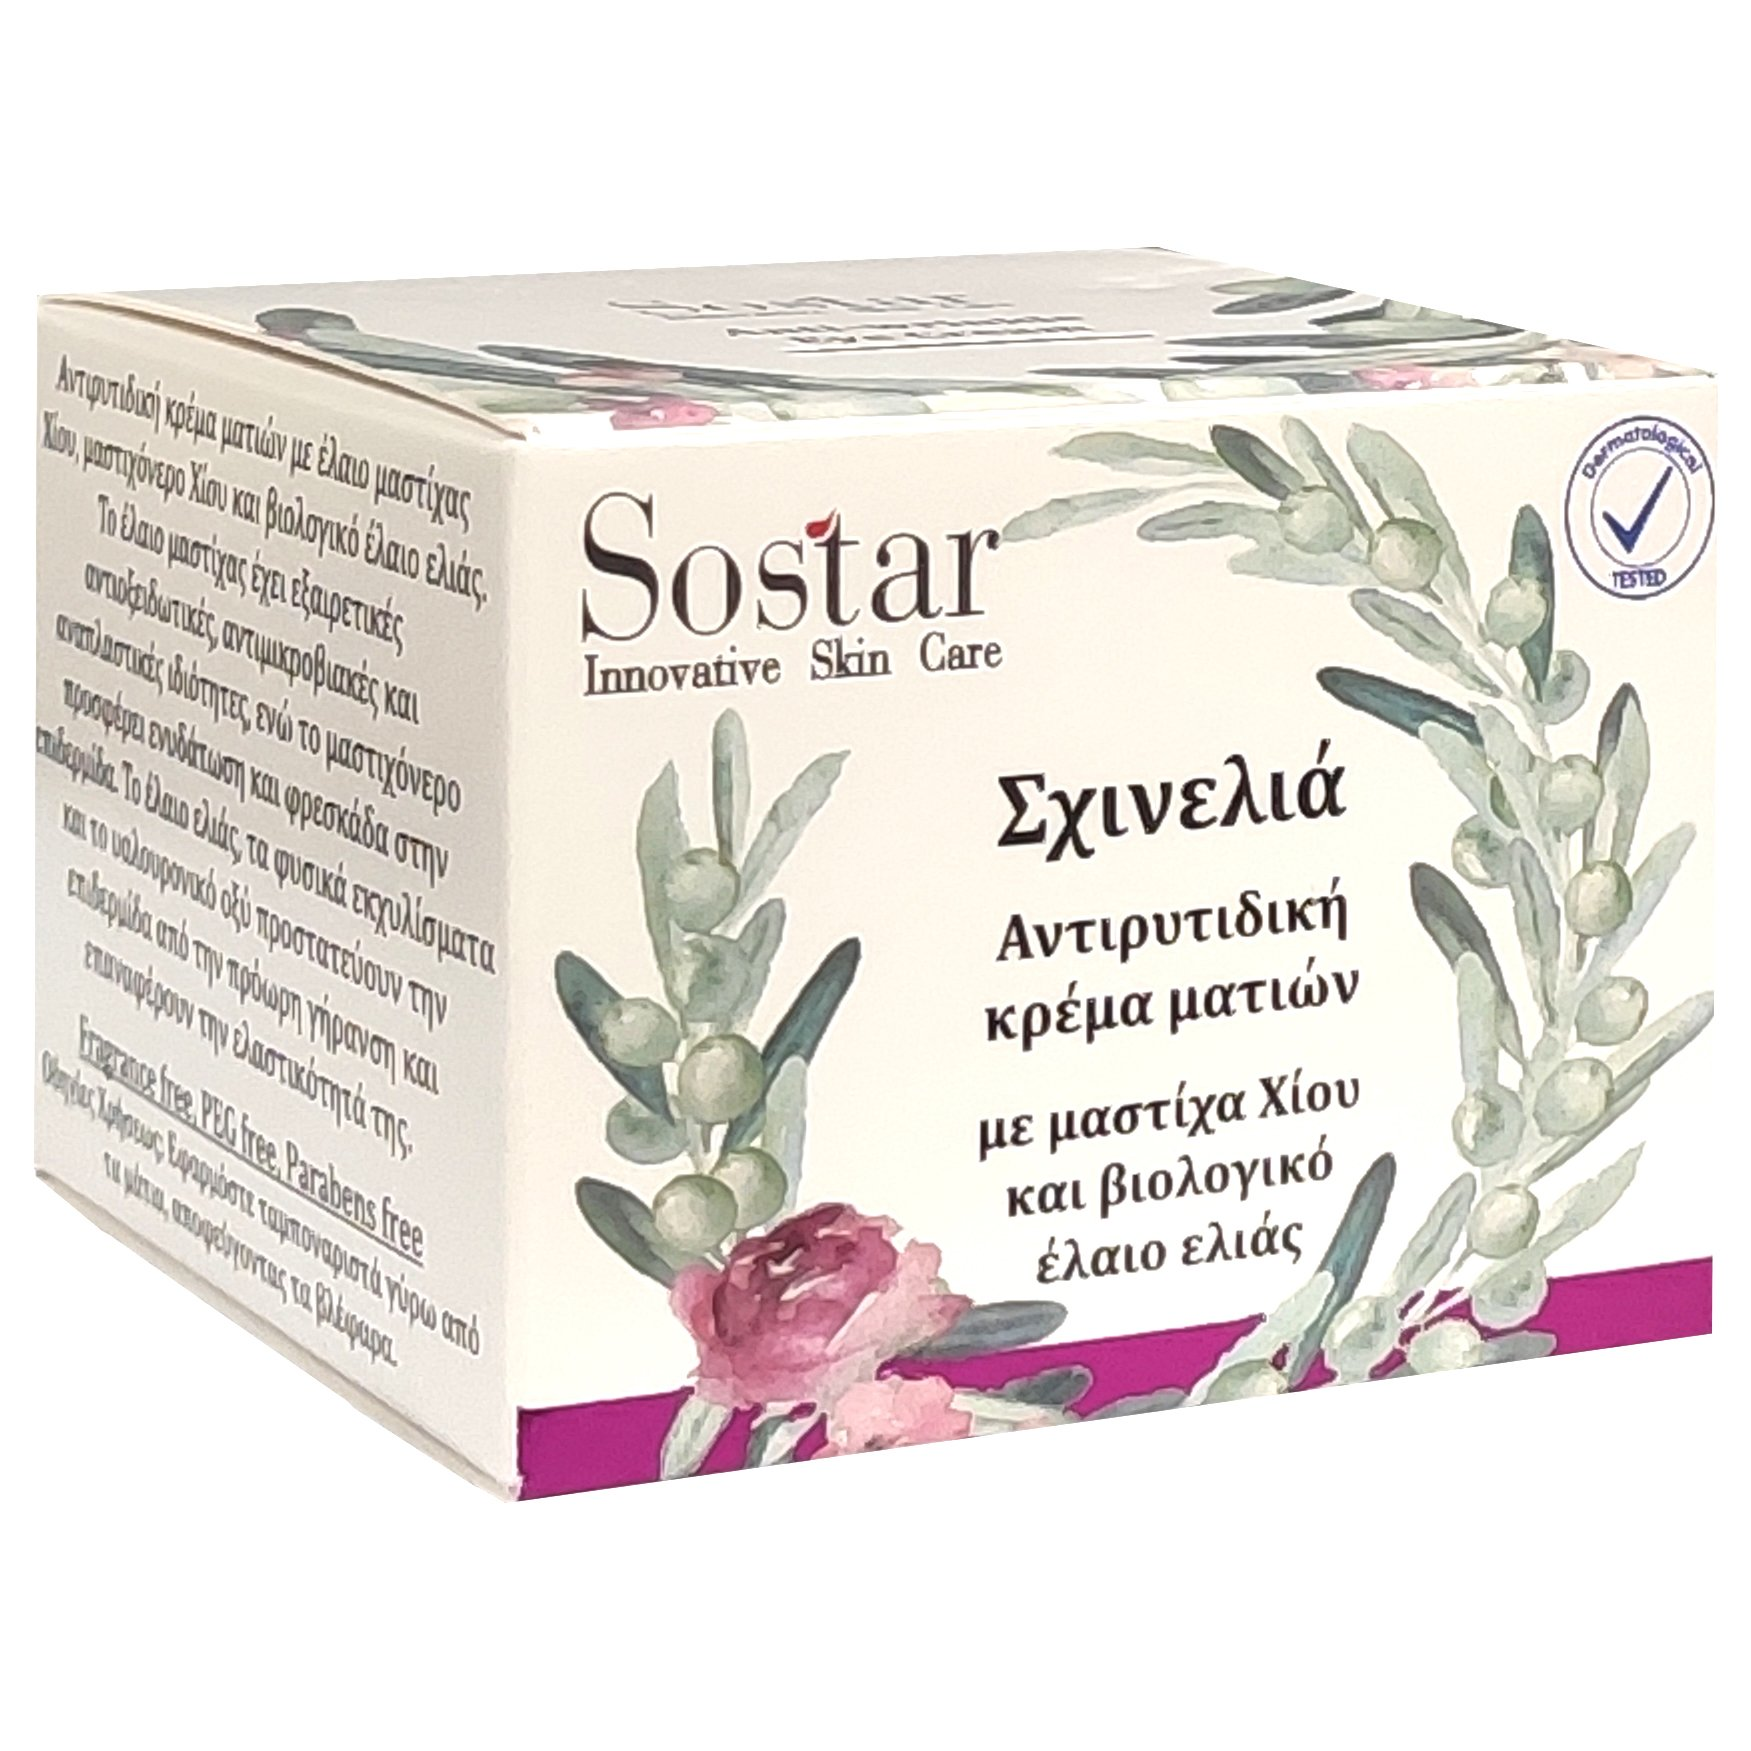 Sostar Skinolia Σχινελιά Αντιρυτιδική Κρέμα Ματιών με Μαστίχα Χίου & Βιολογικό Έλαιο Ελιάς 30ml